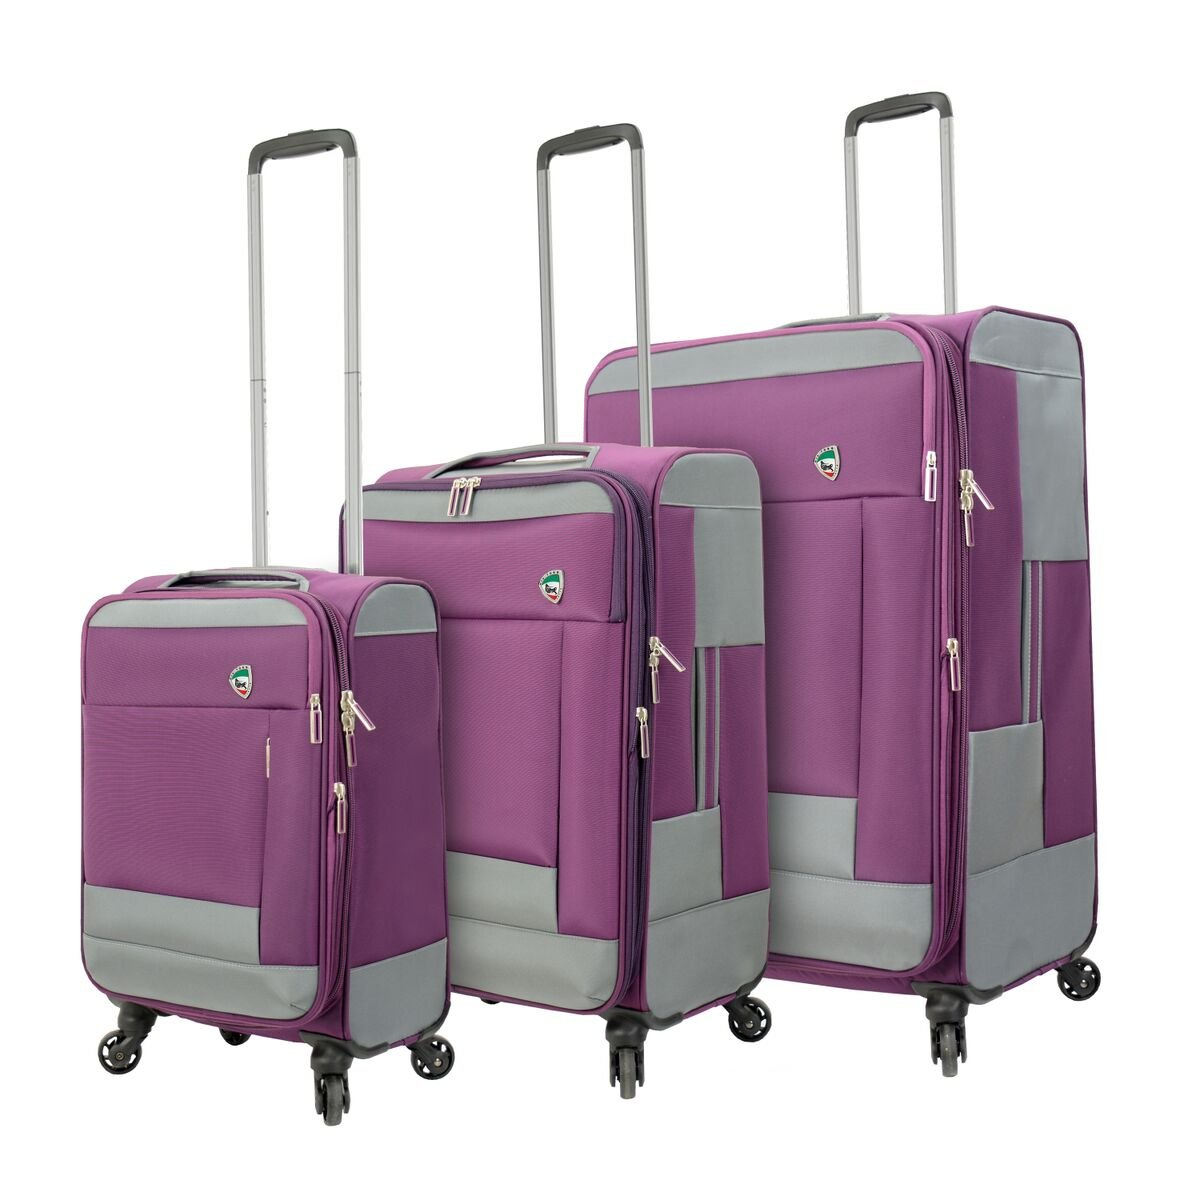 Mia Toro 機内持ち込み手荷物, ピンク, One Size B077FYMFC6 ピンク